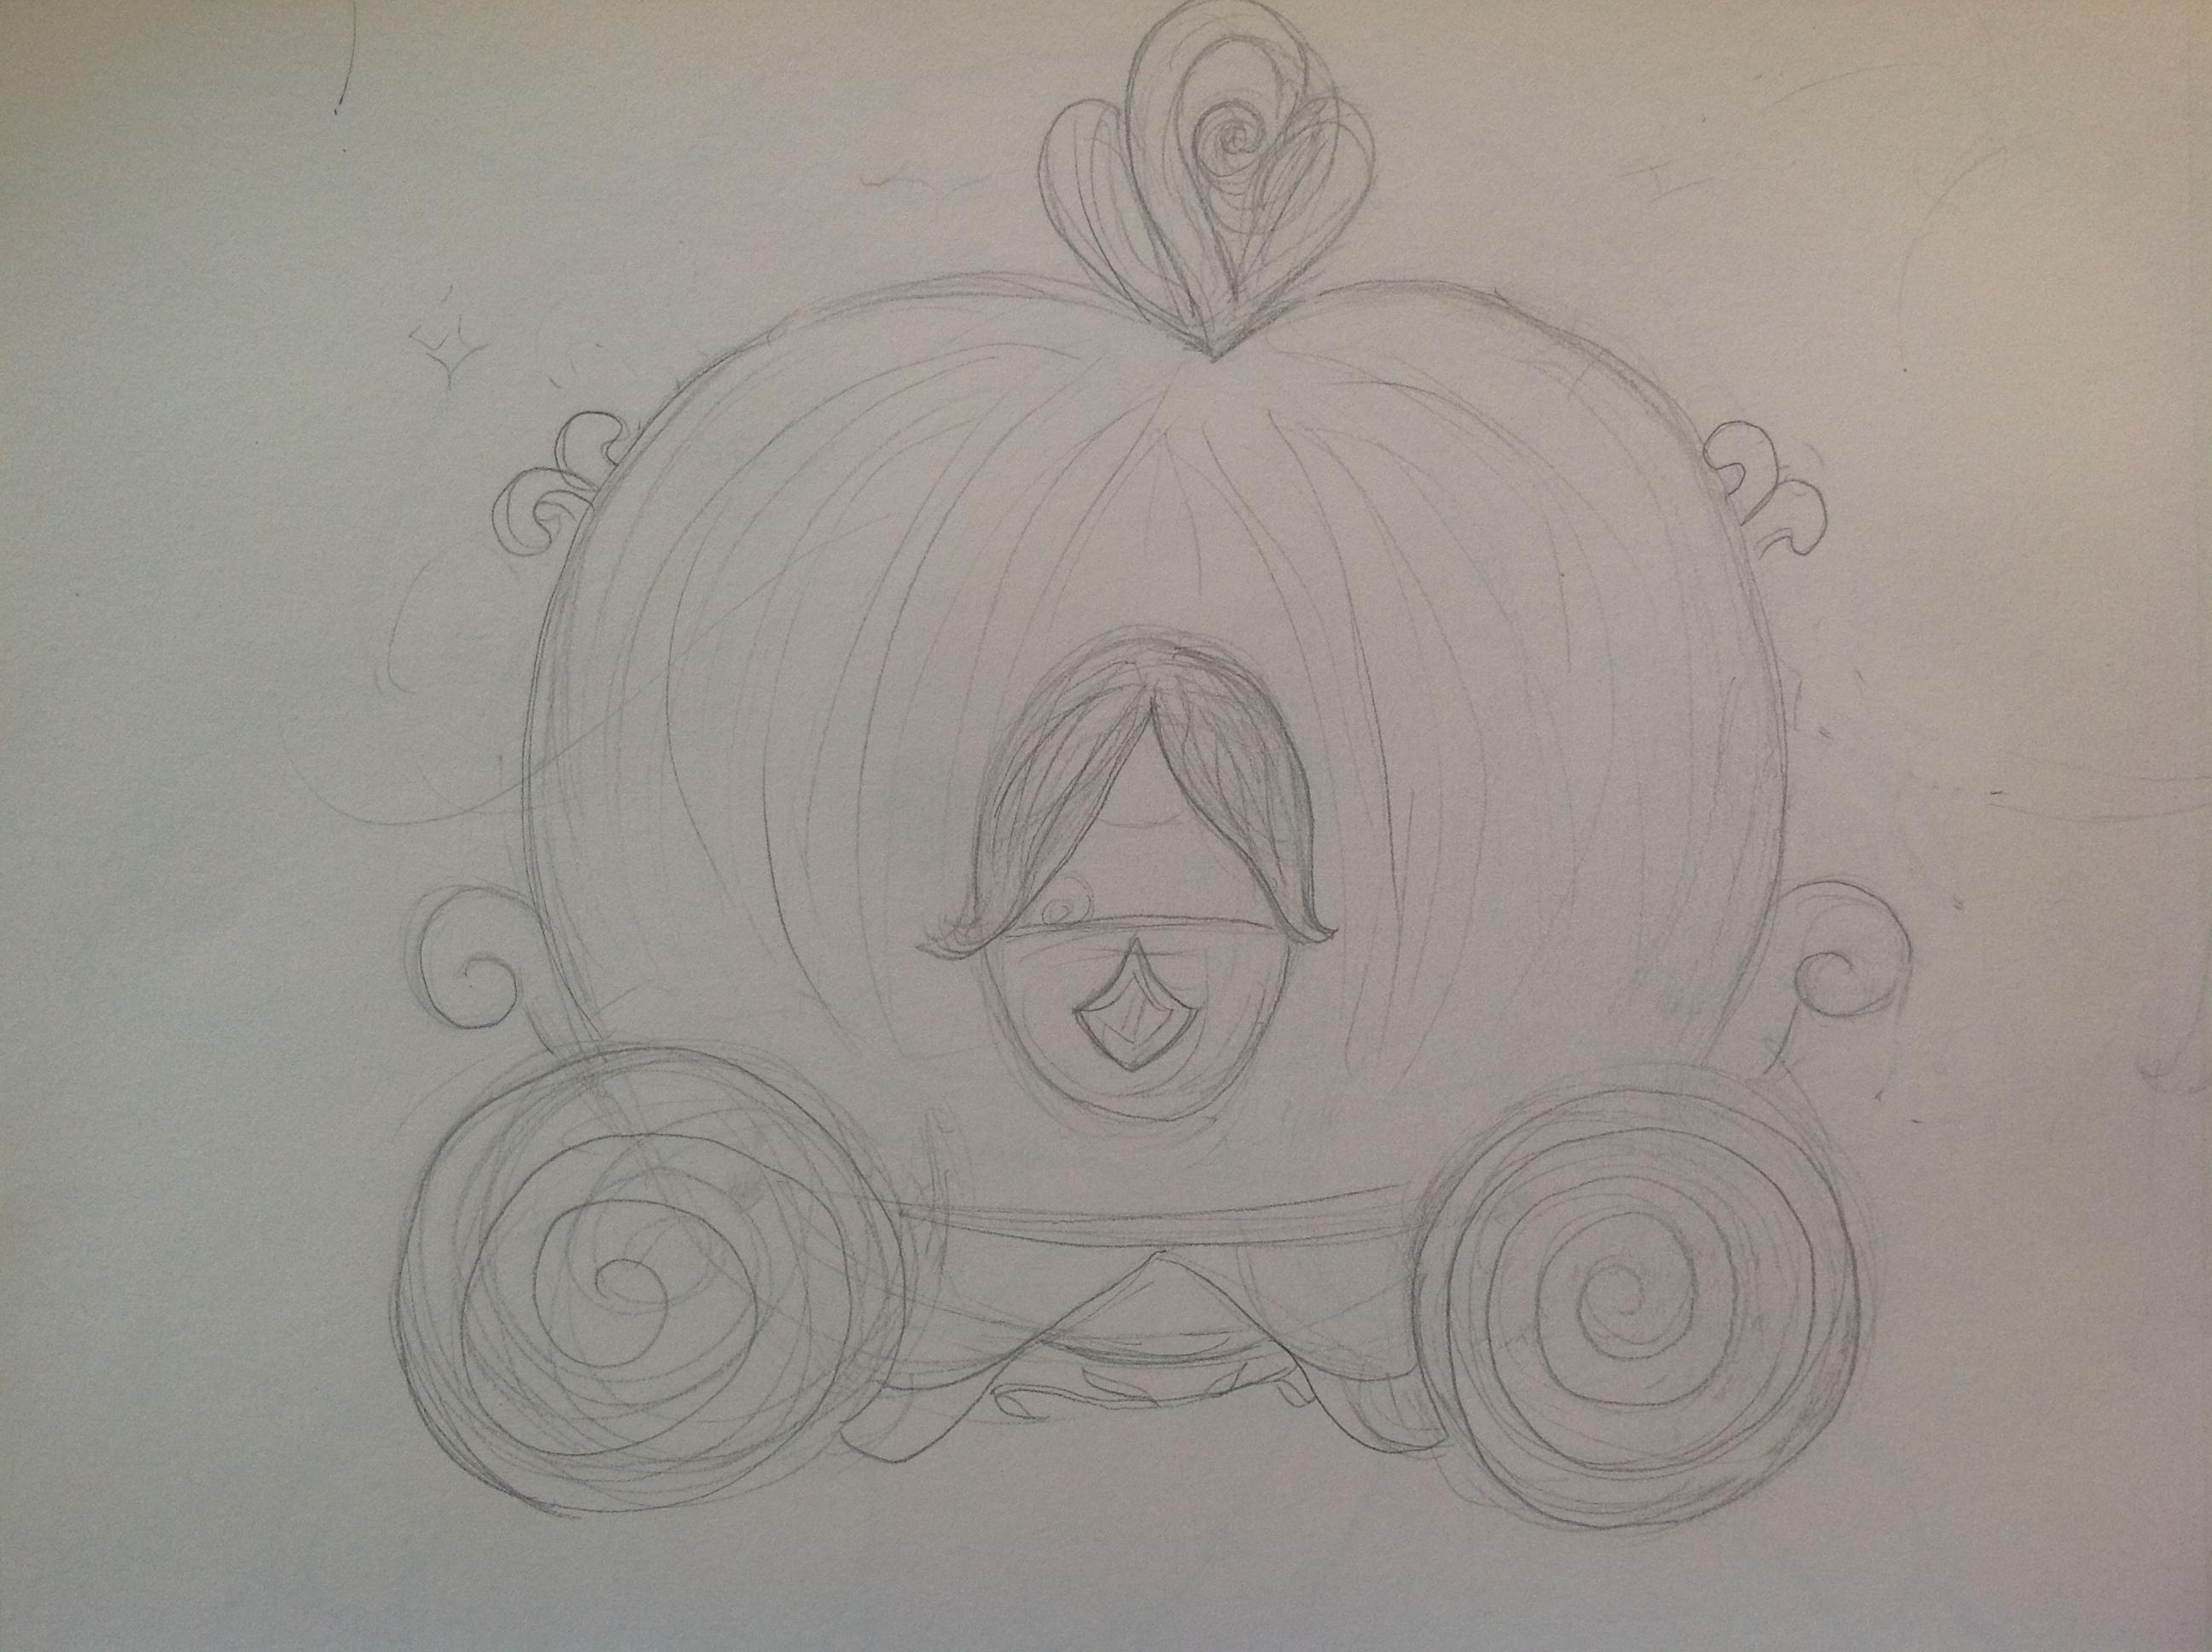 Drawn pumpkin cinderella pumpkin Drawing © Gallery Pumpkin Carriage